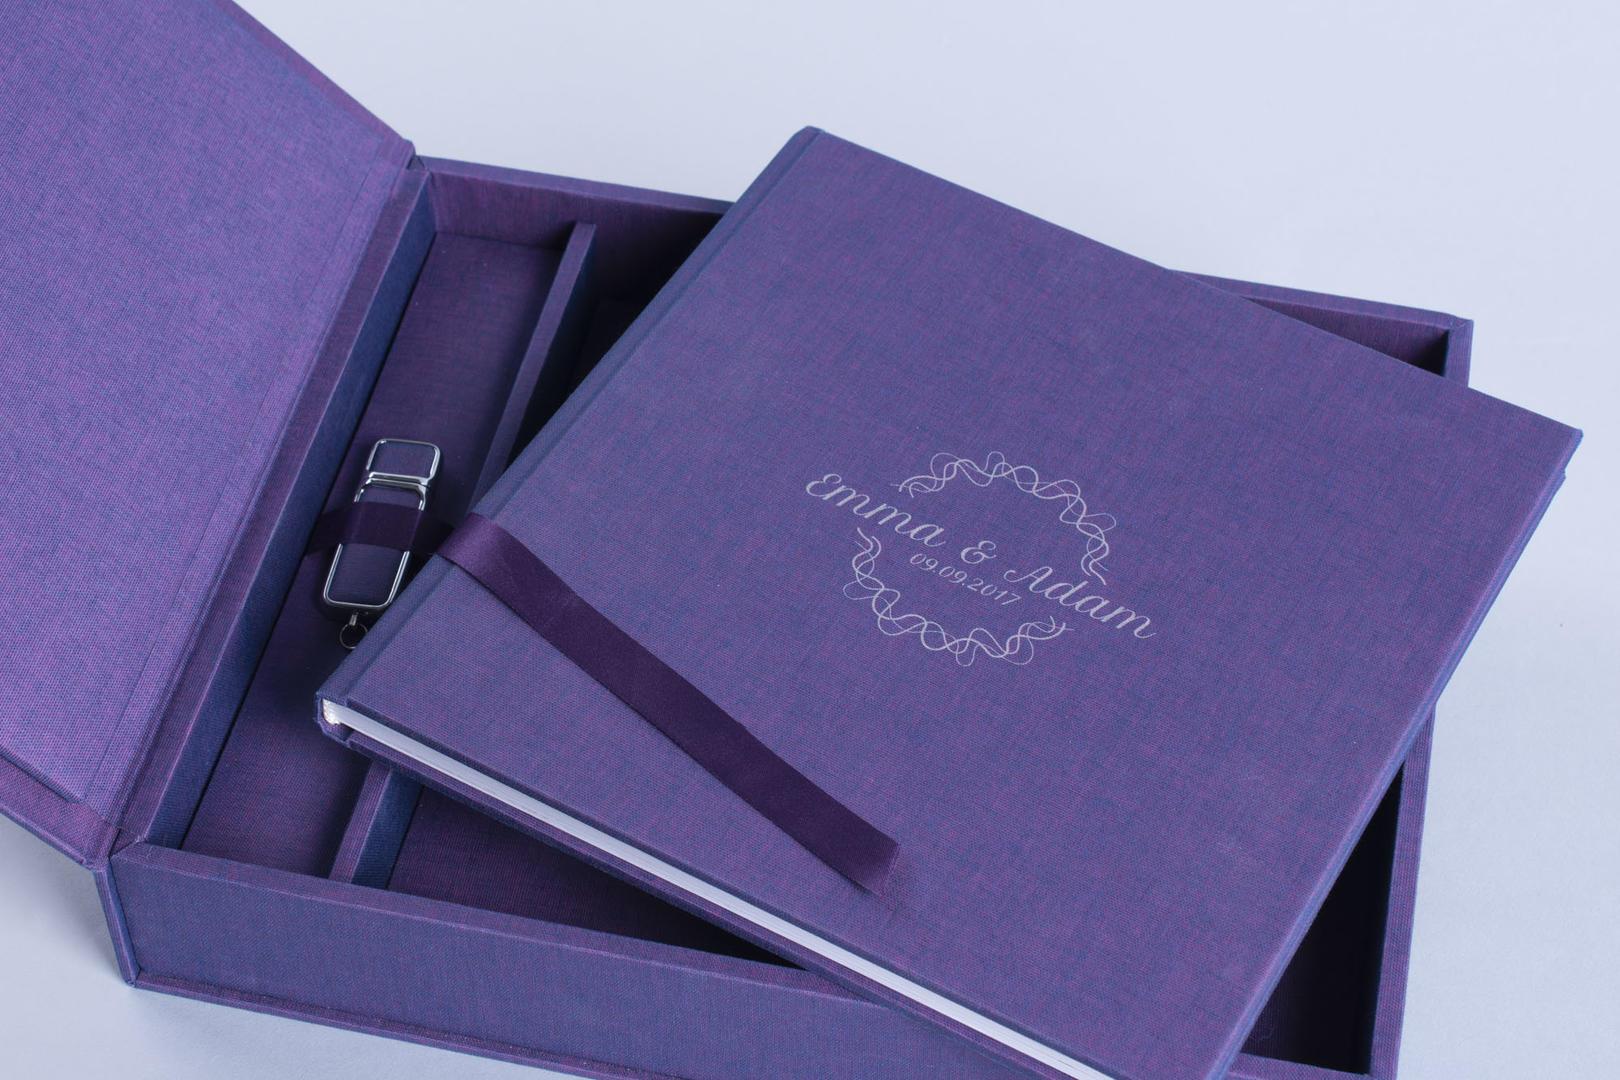 Complete Album Set Photo Album Album Box USB Stick Flash Drive 3 in 1 Gamma collection cover pattern UV print laser etch